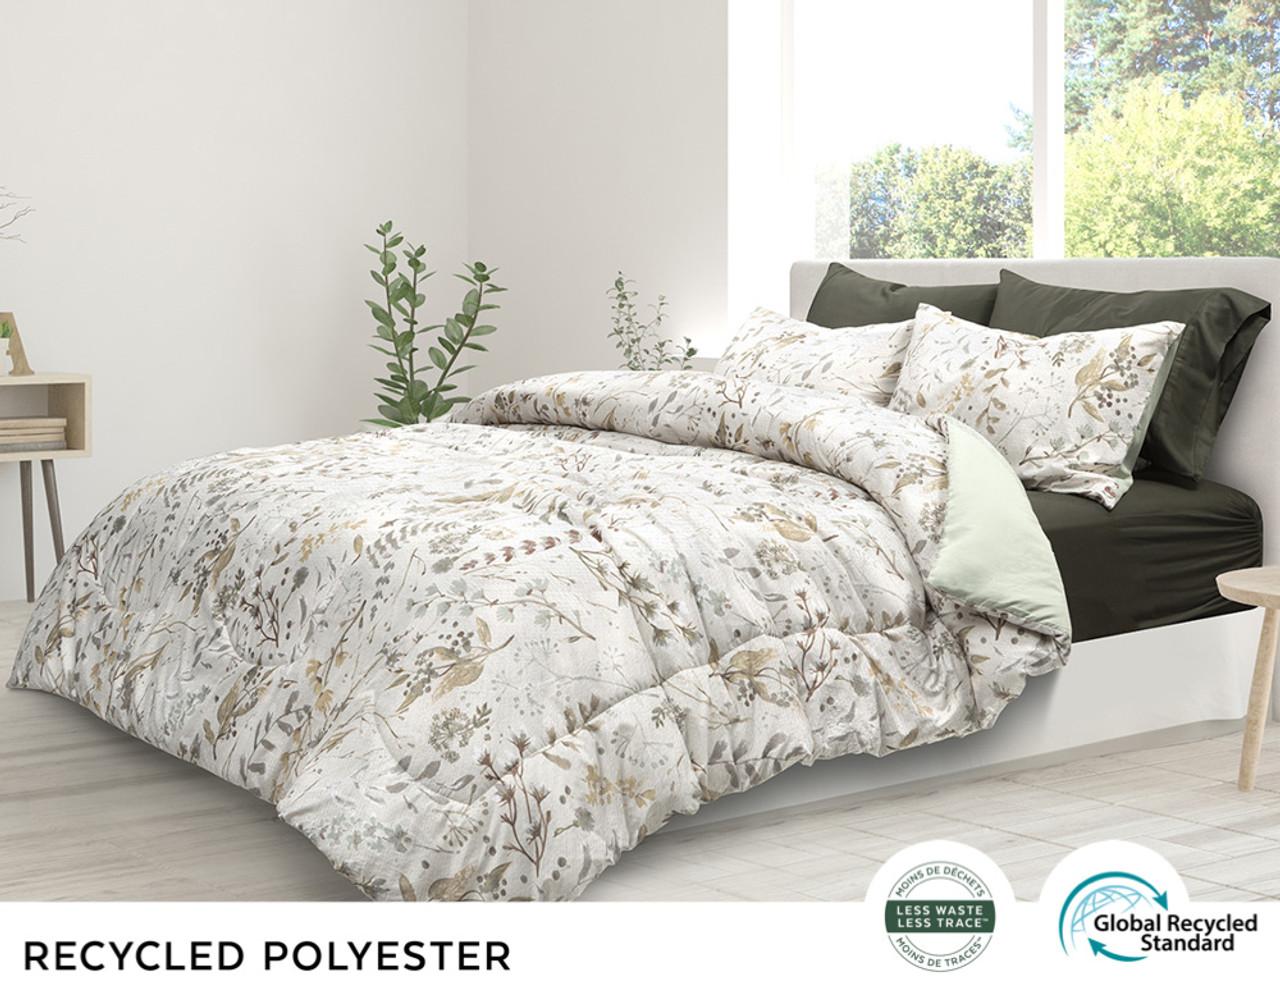 Shawnigan comforter set, side view. Shown with gentle botanicals in smooth neutrals.